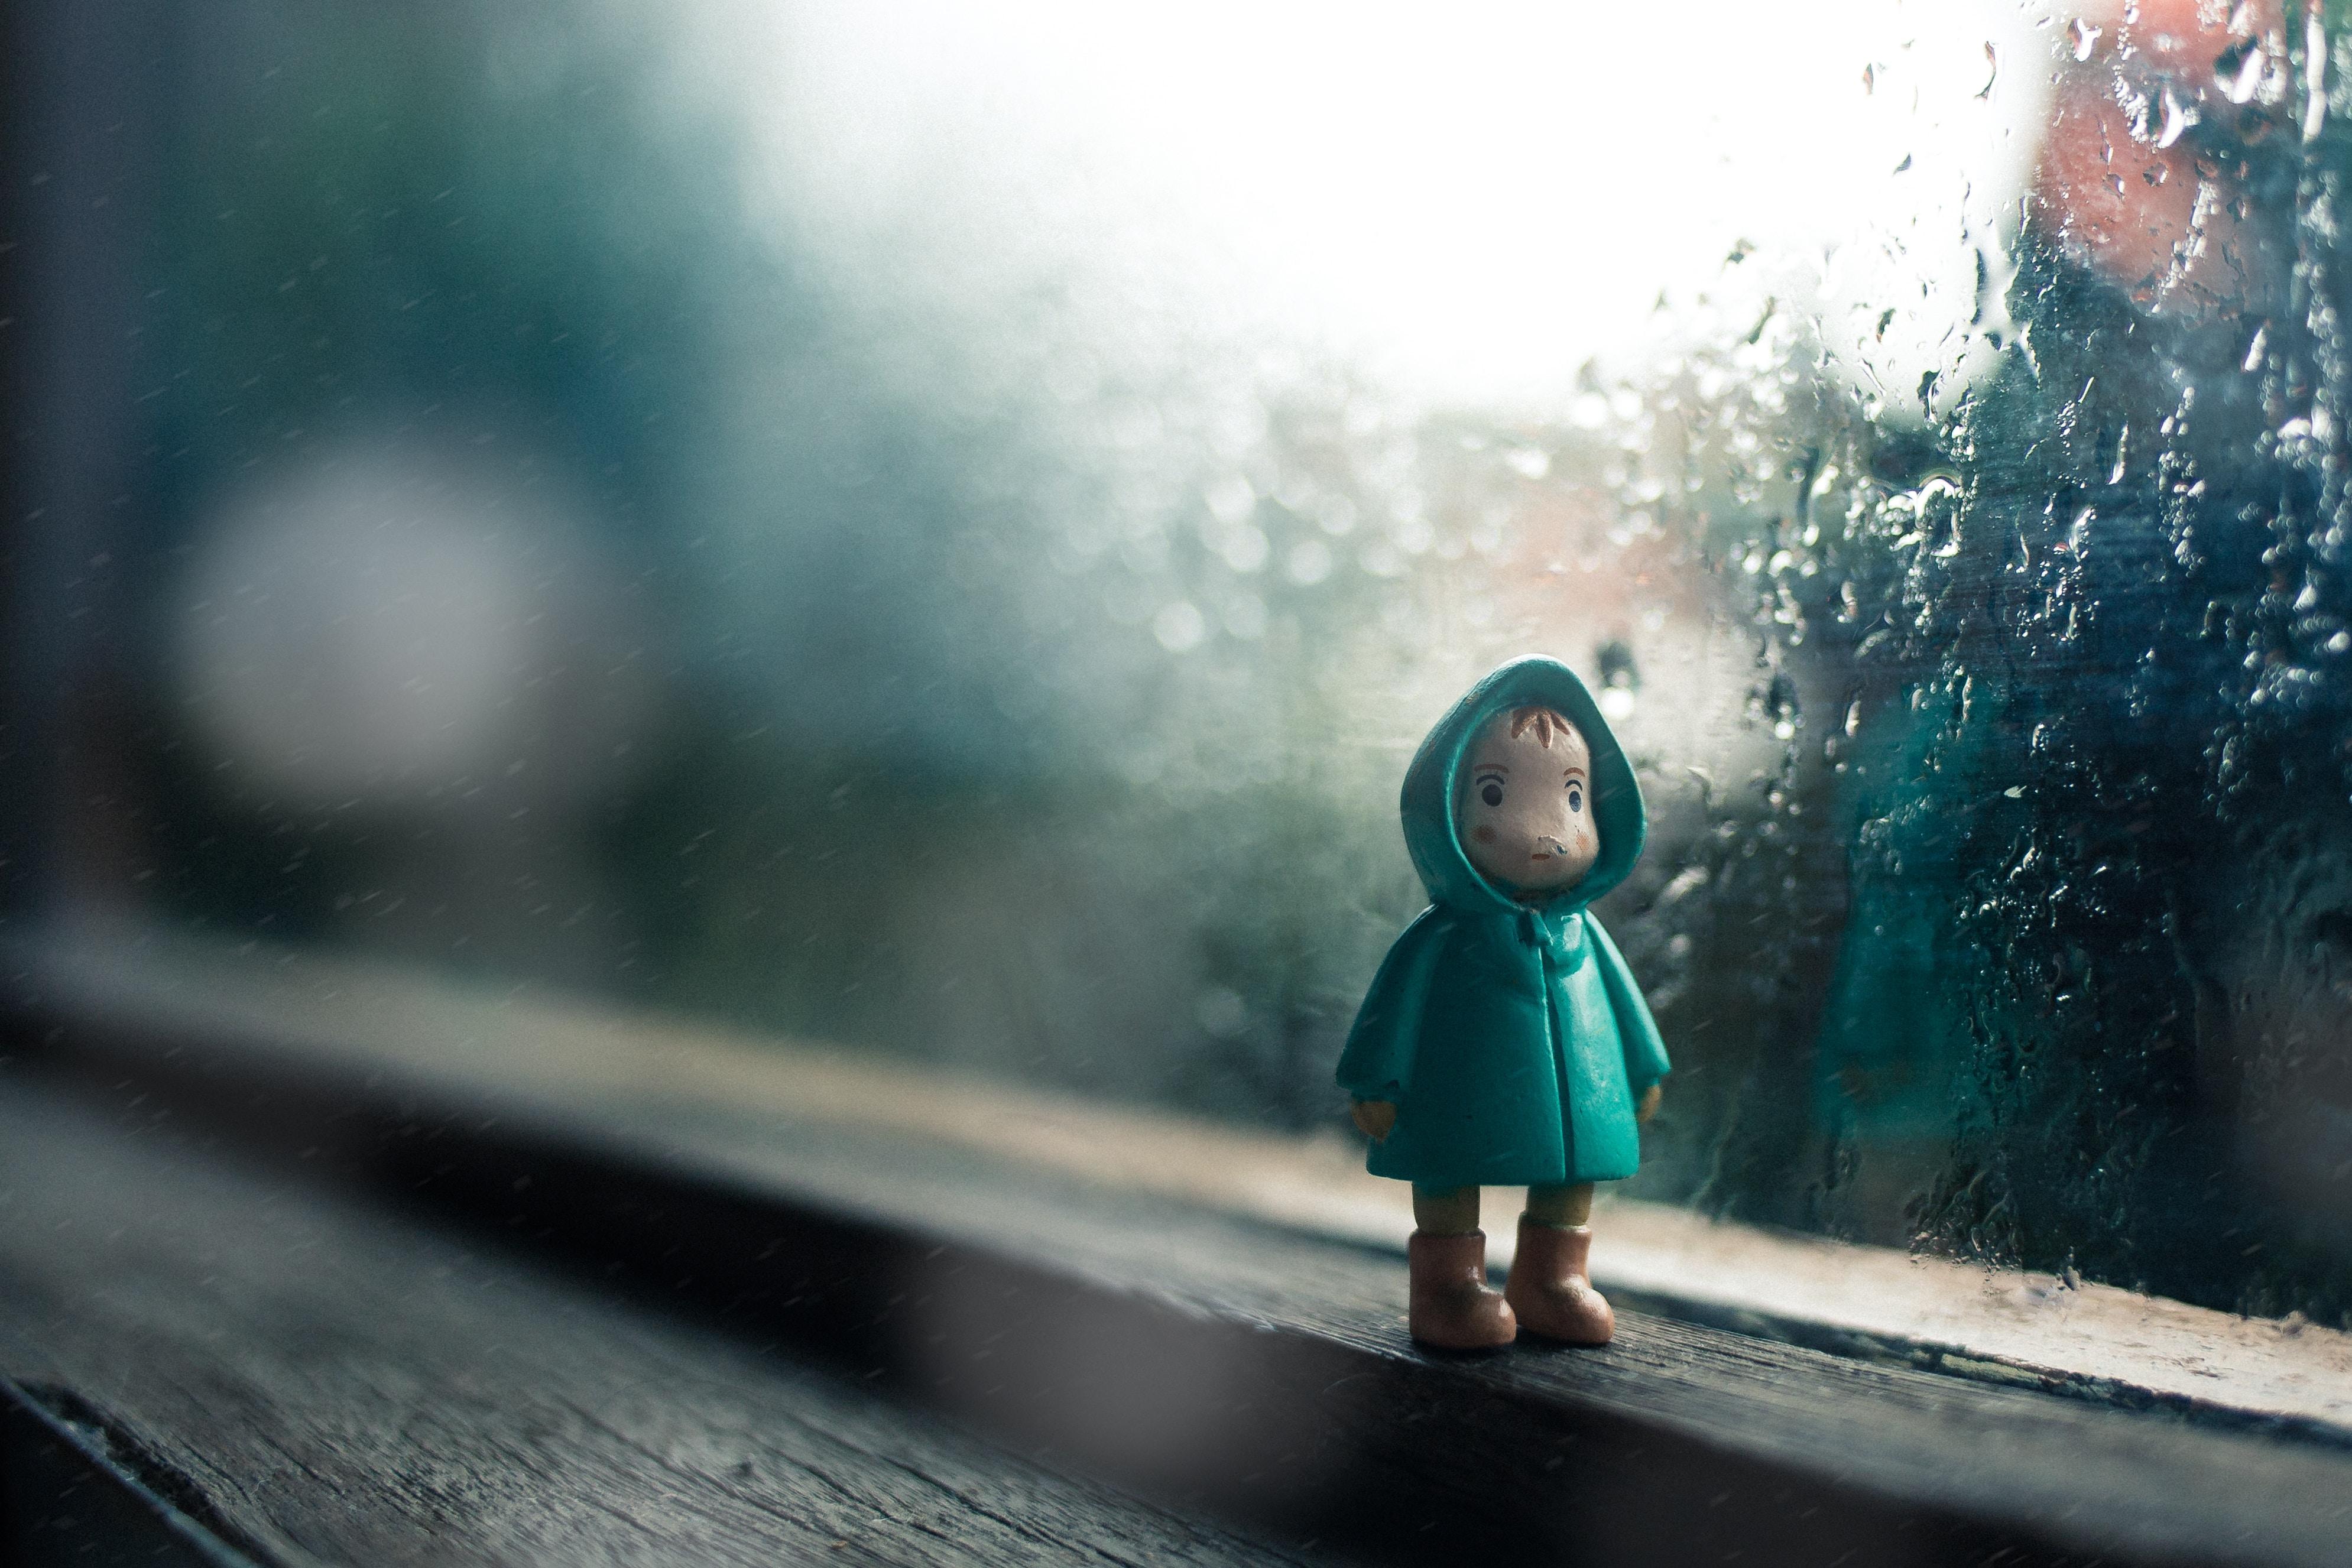 """When it Rains"" sadness stories"